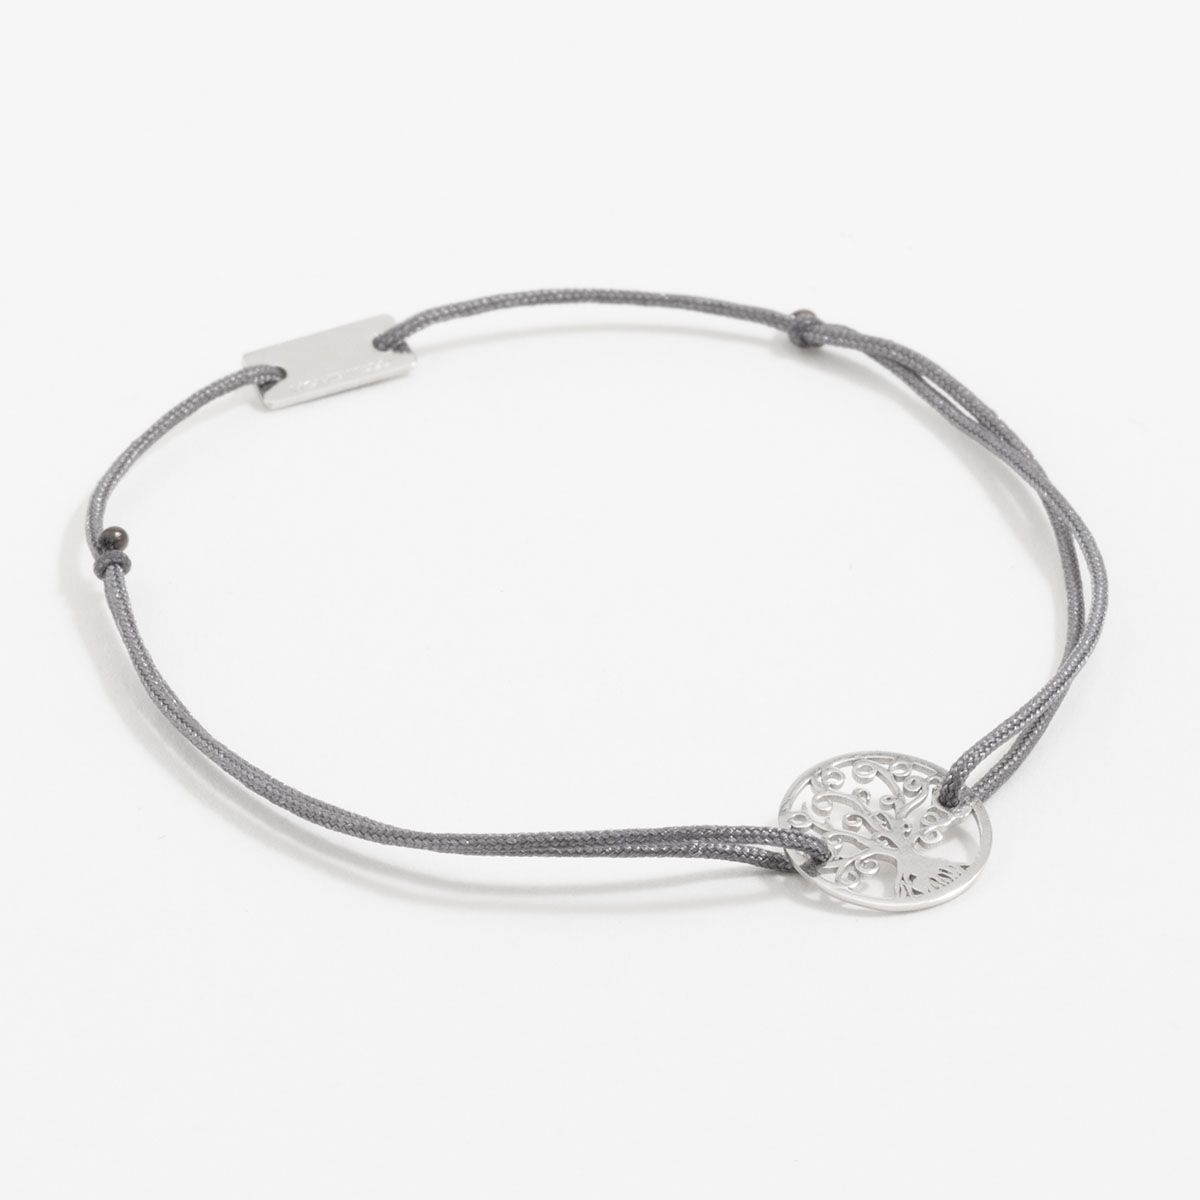 Calen - Armband - Dunkelgrau